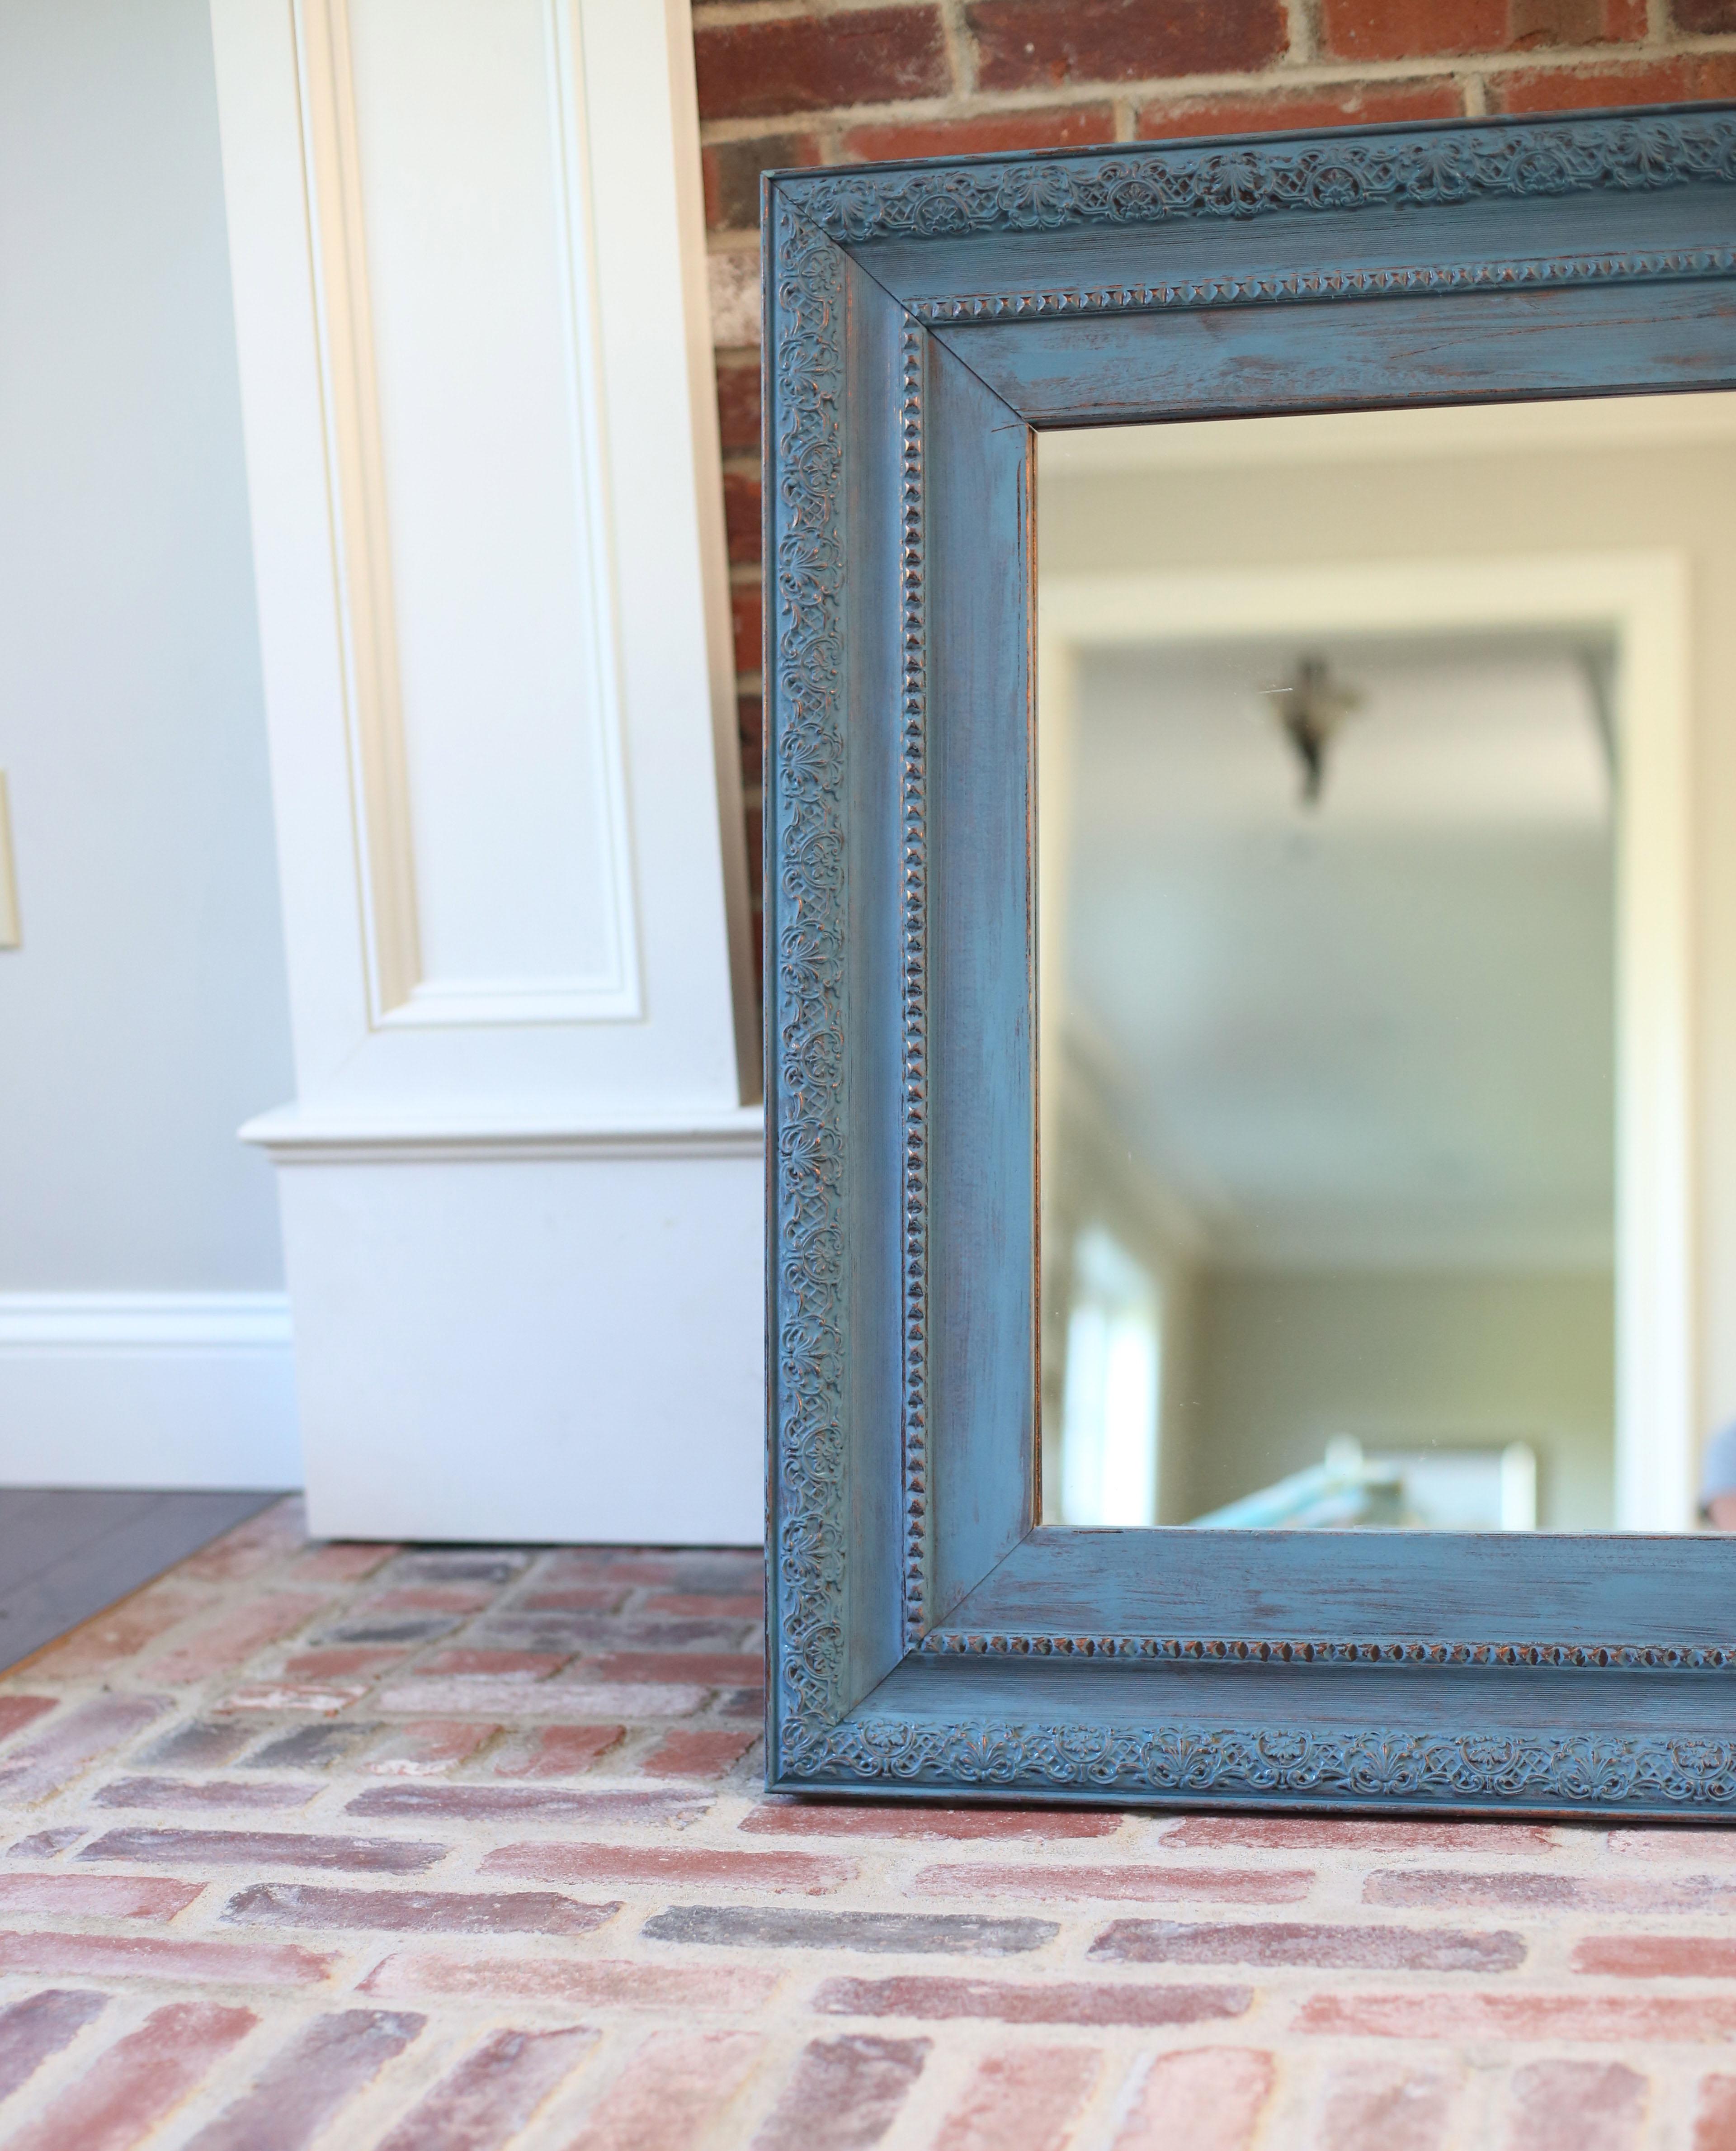 Annie Sloan Chalk Paint: DIY Mirror Update | Nice and Knit